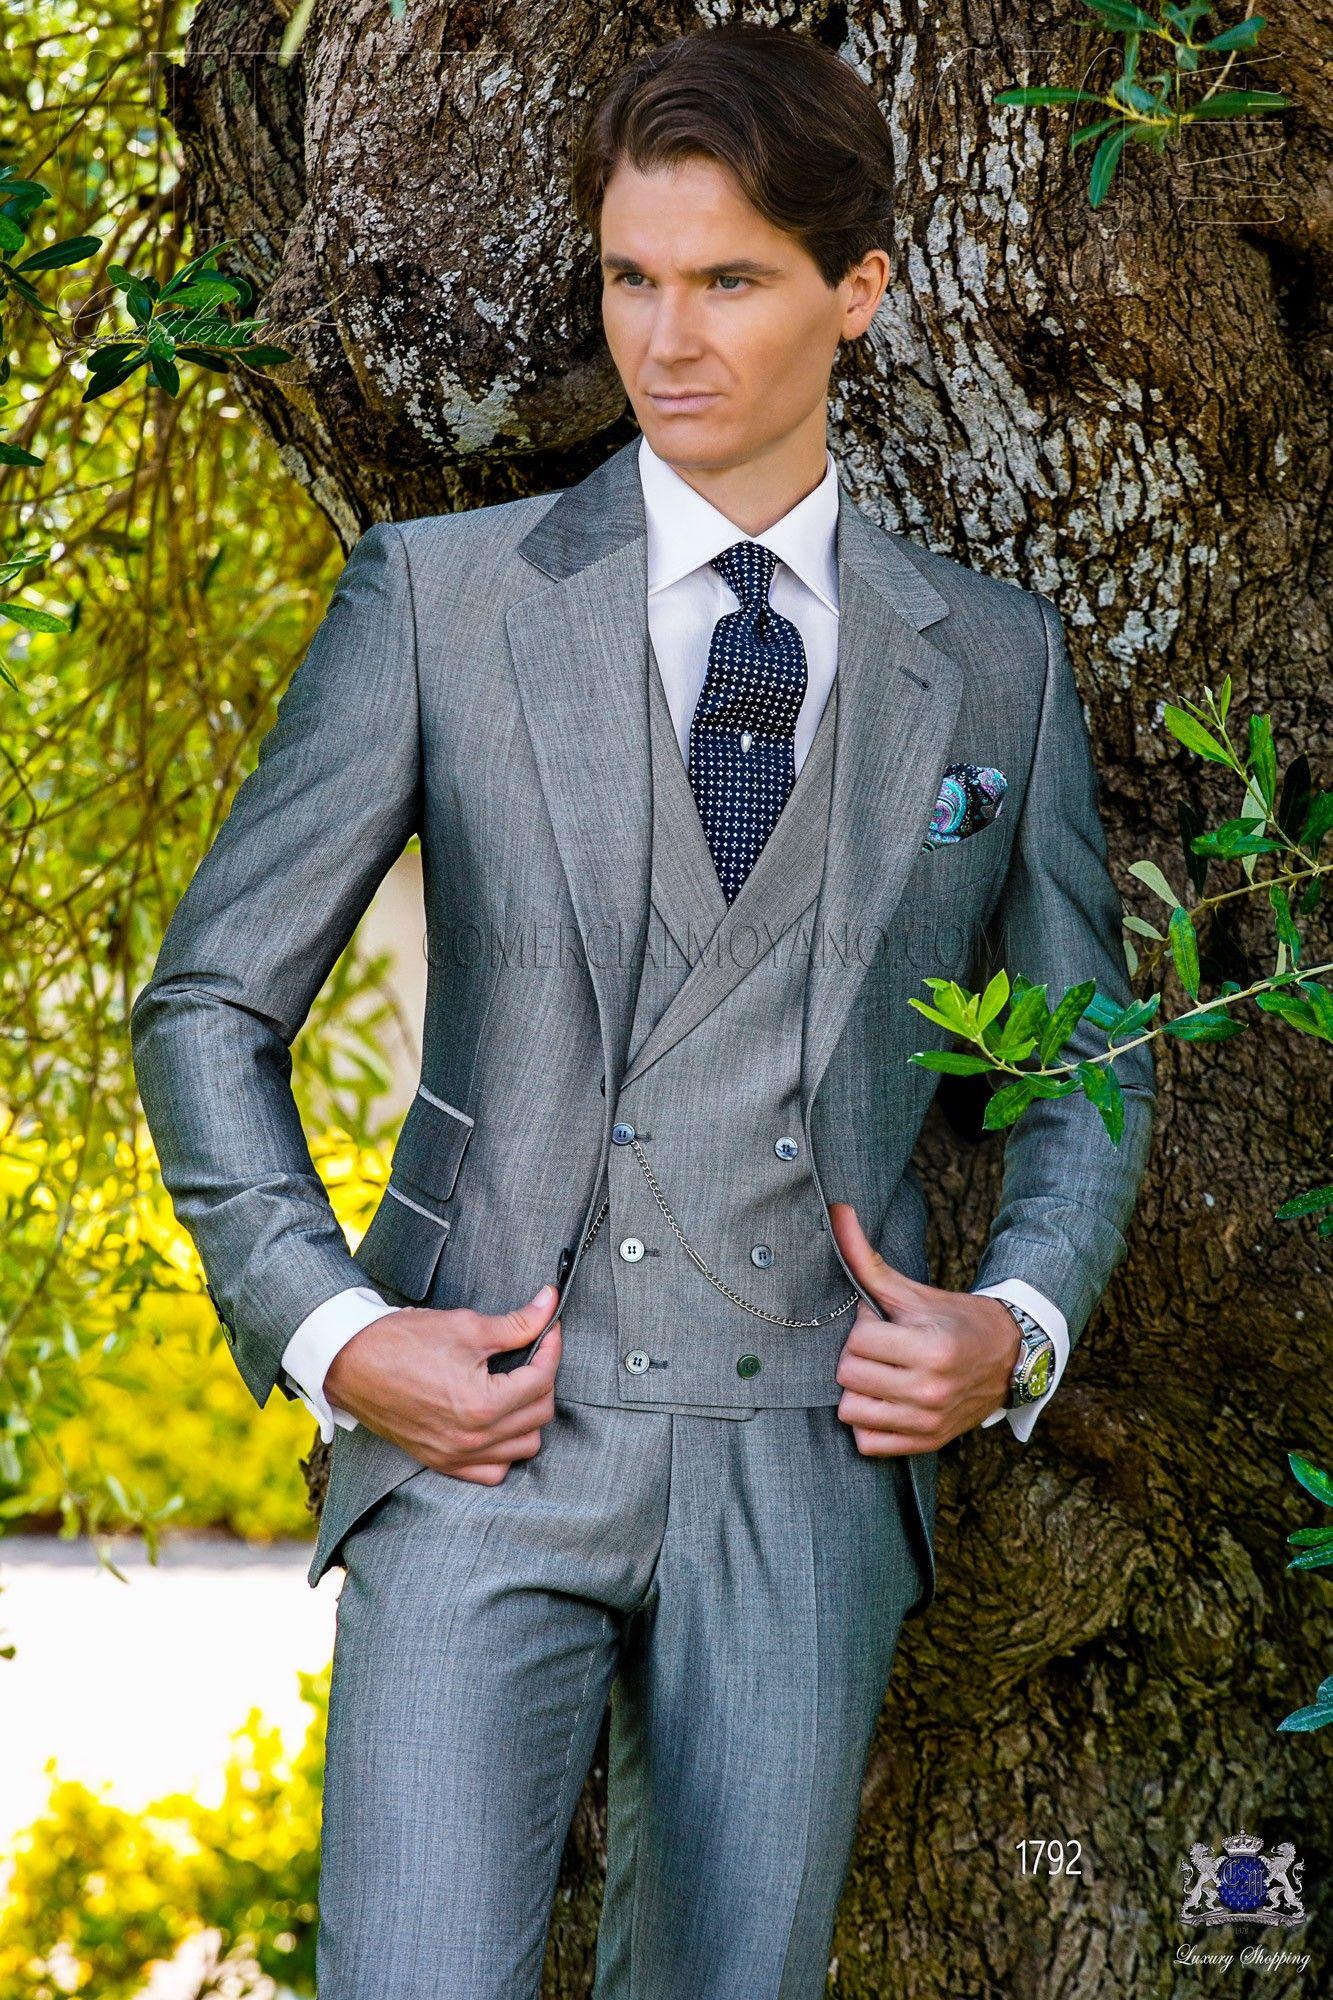 traje de novio gris de lana mohair alpaca three piece suits pinterest hochzeitsanzug. Black Bedroom Furniture Sets. Home Design Ideas